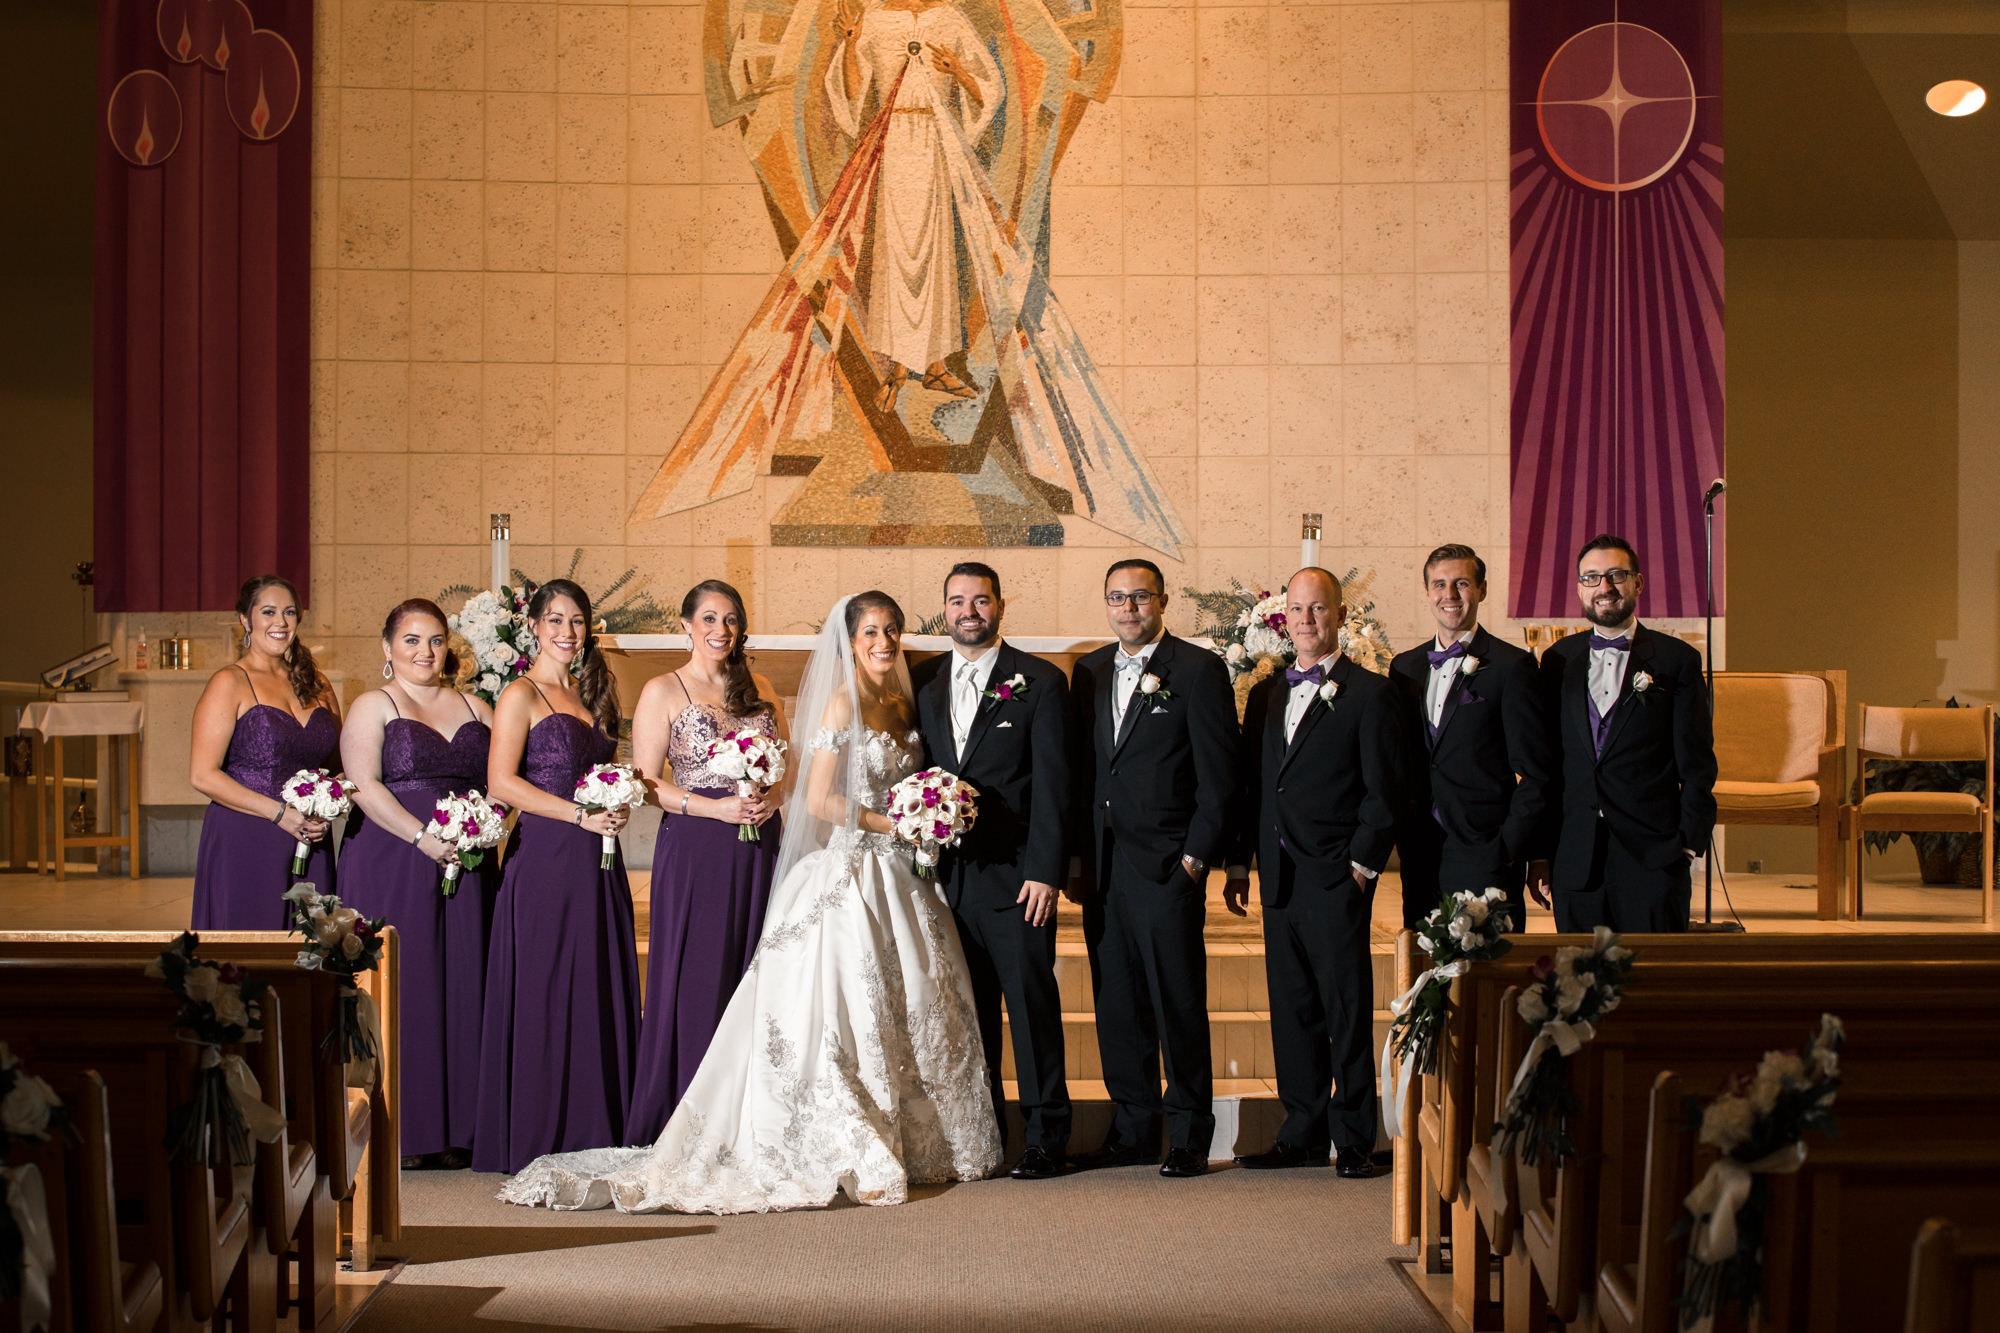 Benvenuto_Wedding_catholic_Florida_Bride-Groom-59.jpg